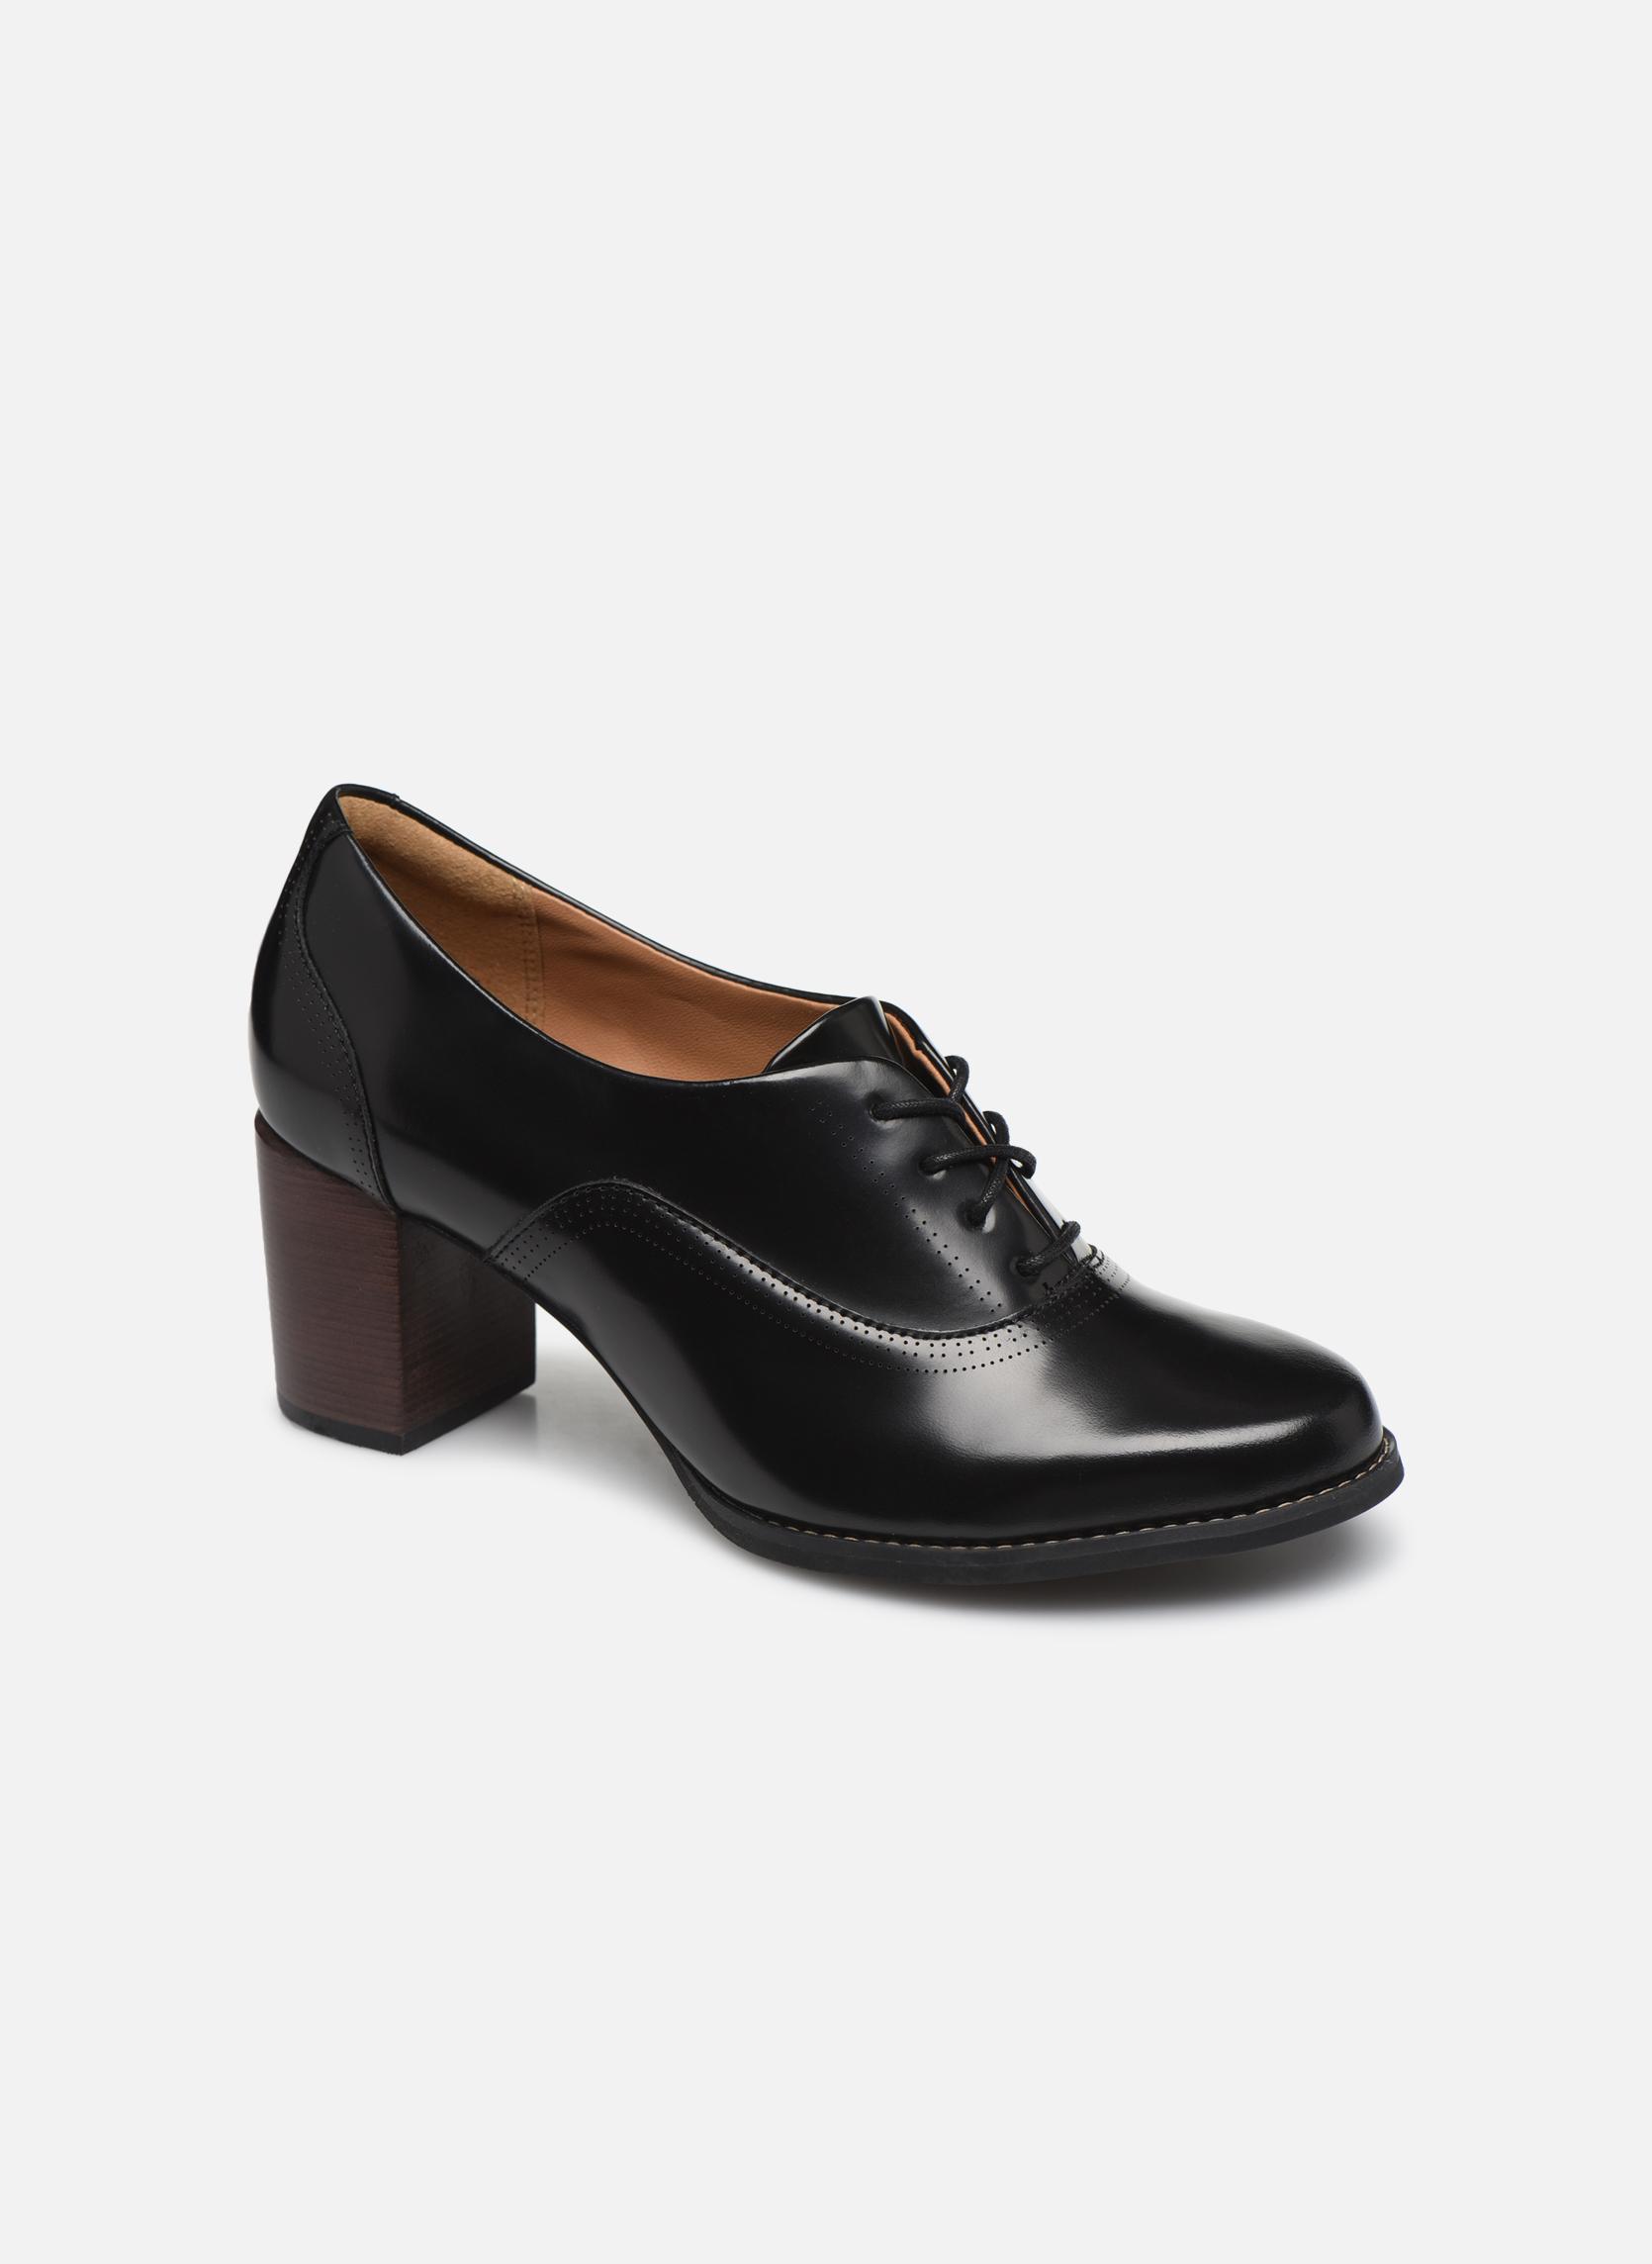 Tarah Victoria Black leather